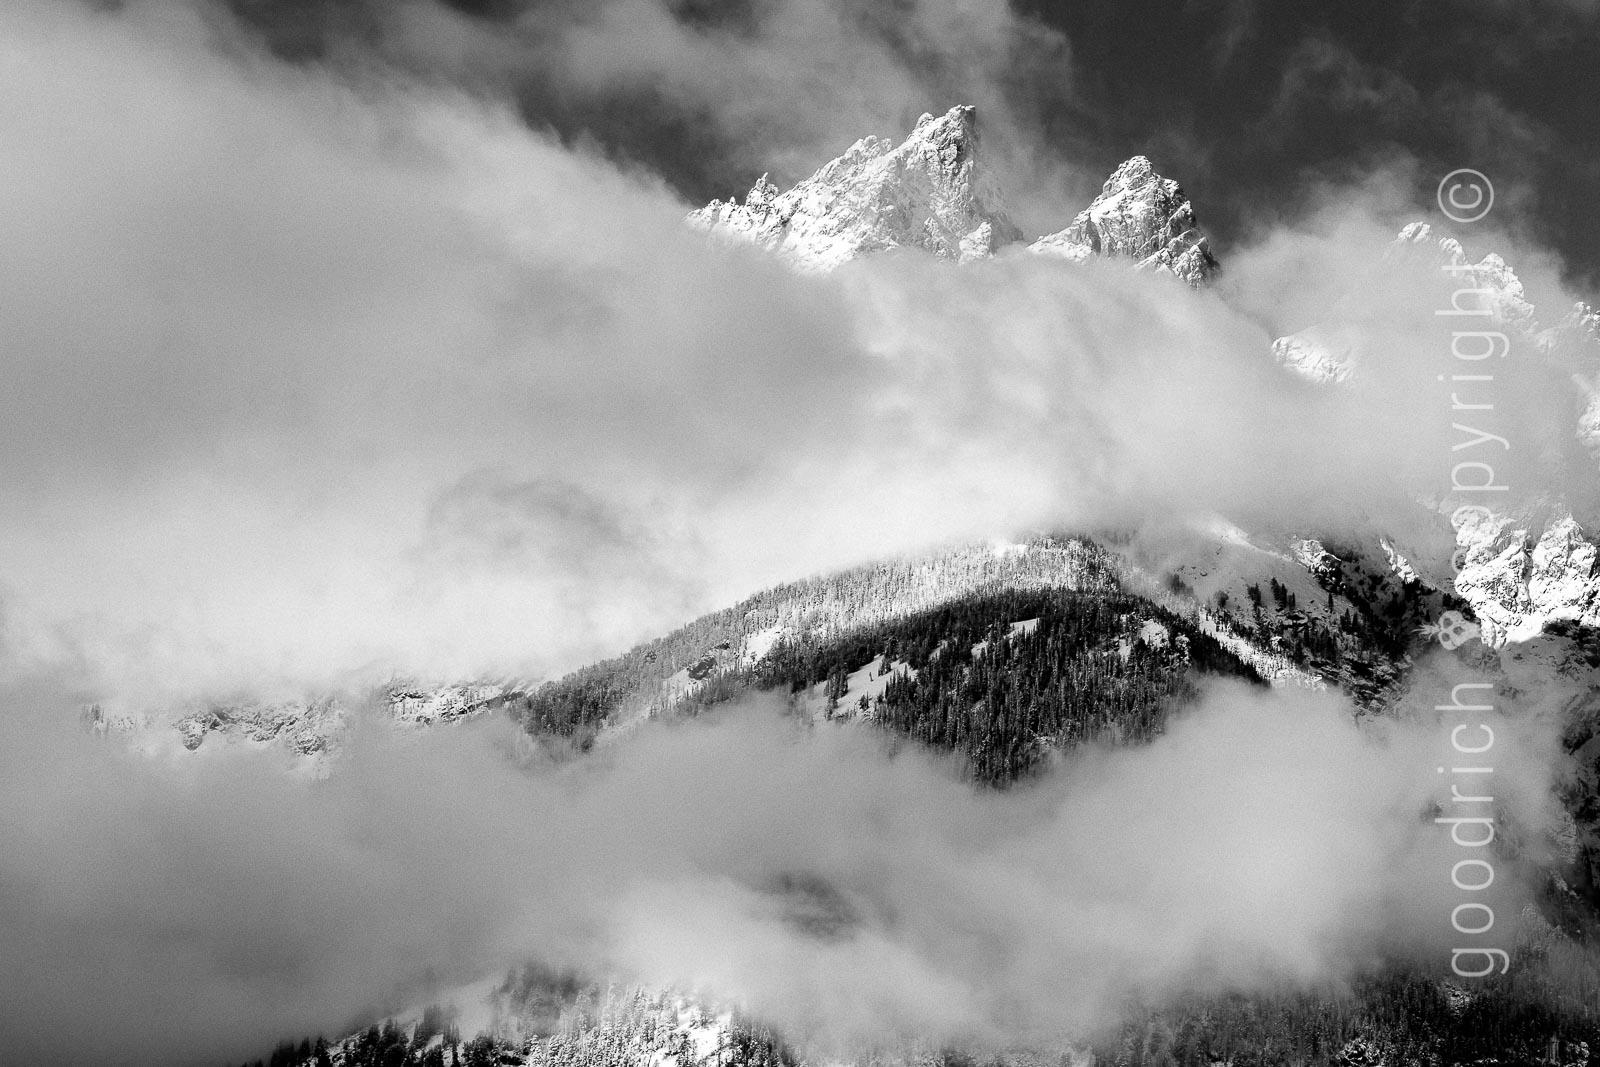 lightroom classic cc - Grand Teton with New Snow by Jay Goodrich